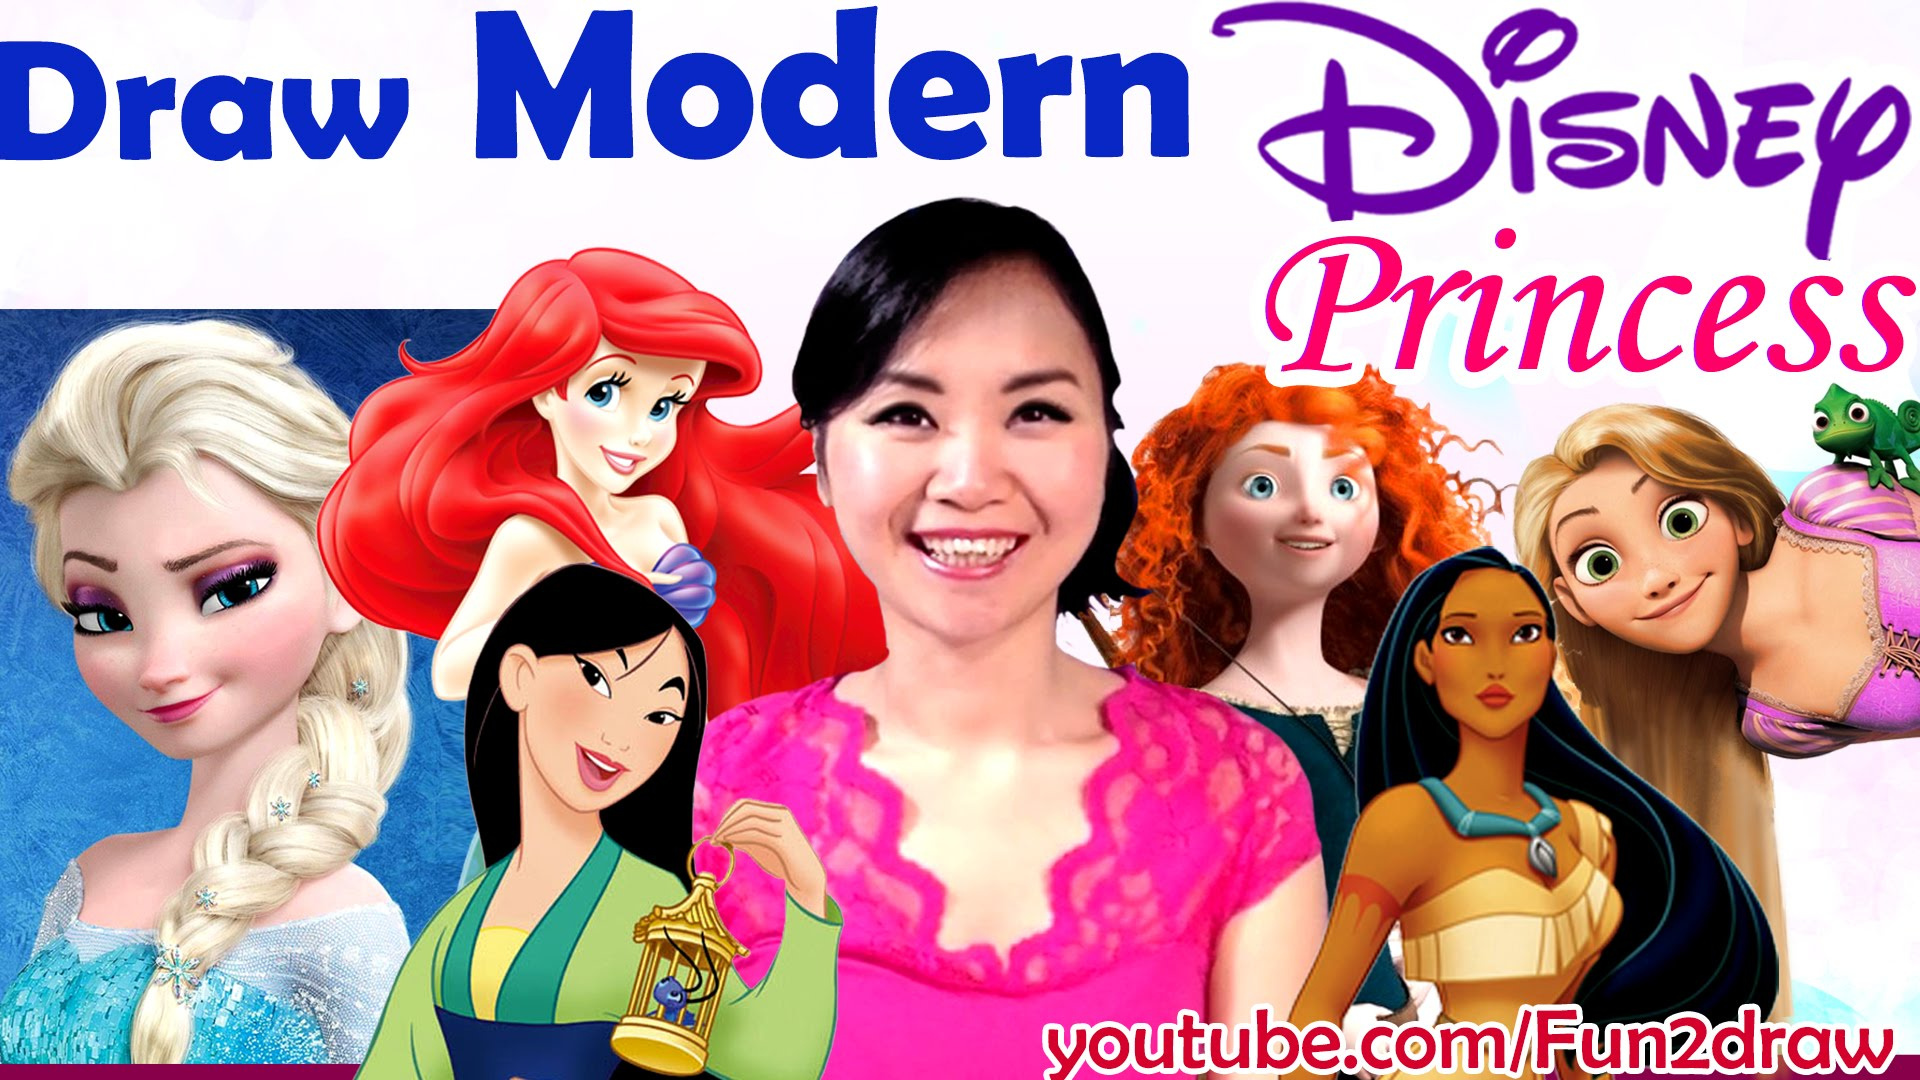 Drawn princess modern As Video Fun  GIRLS!